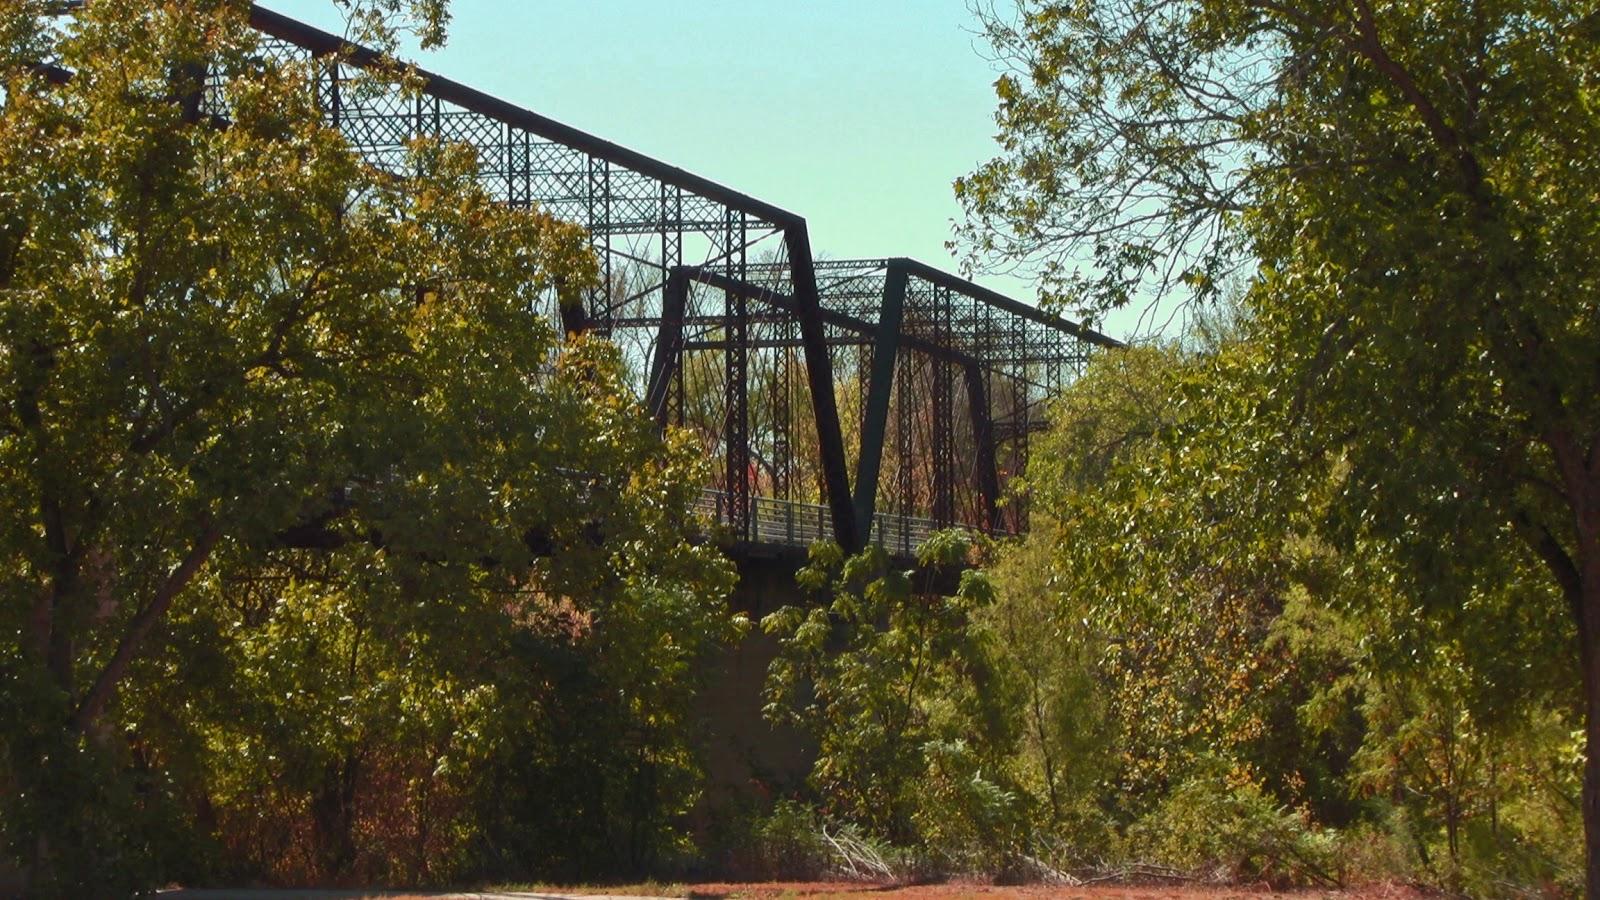 Haunted places in texas moore s crossing bridge austin tx dead